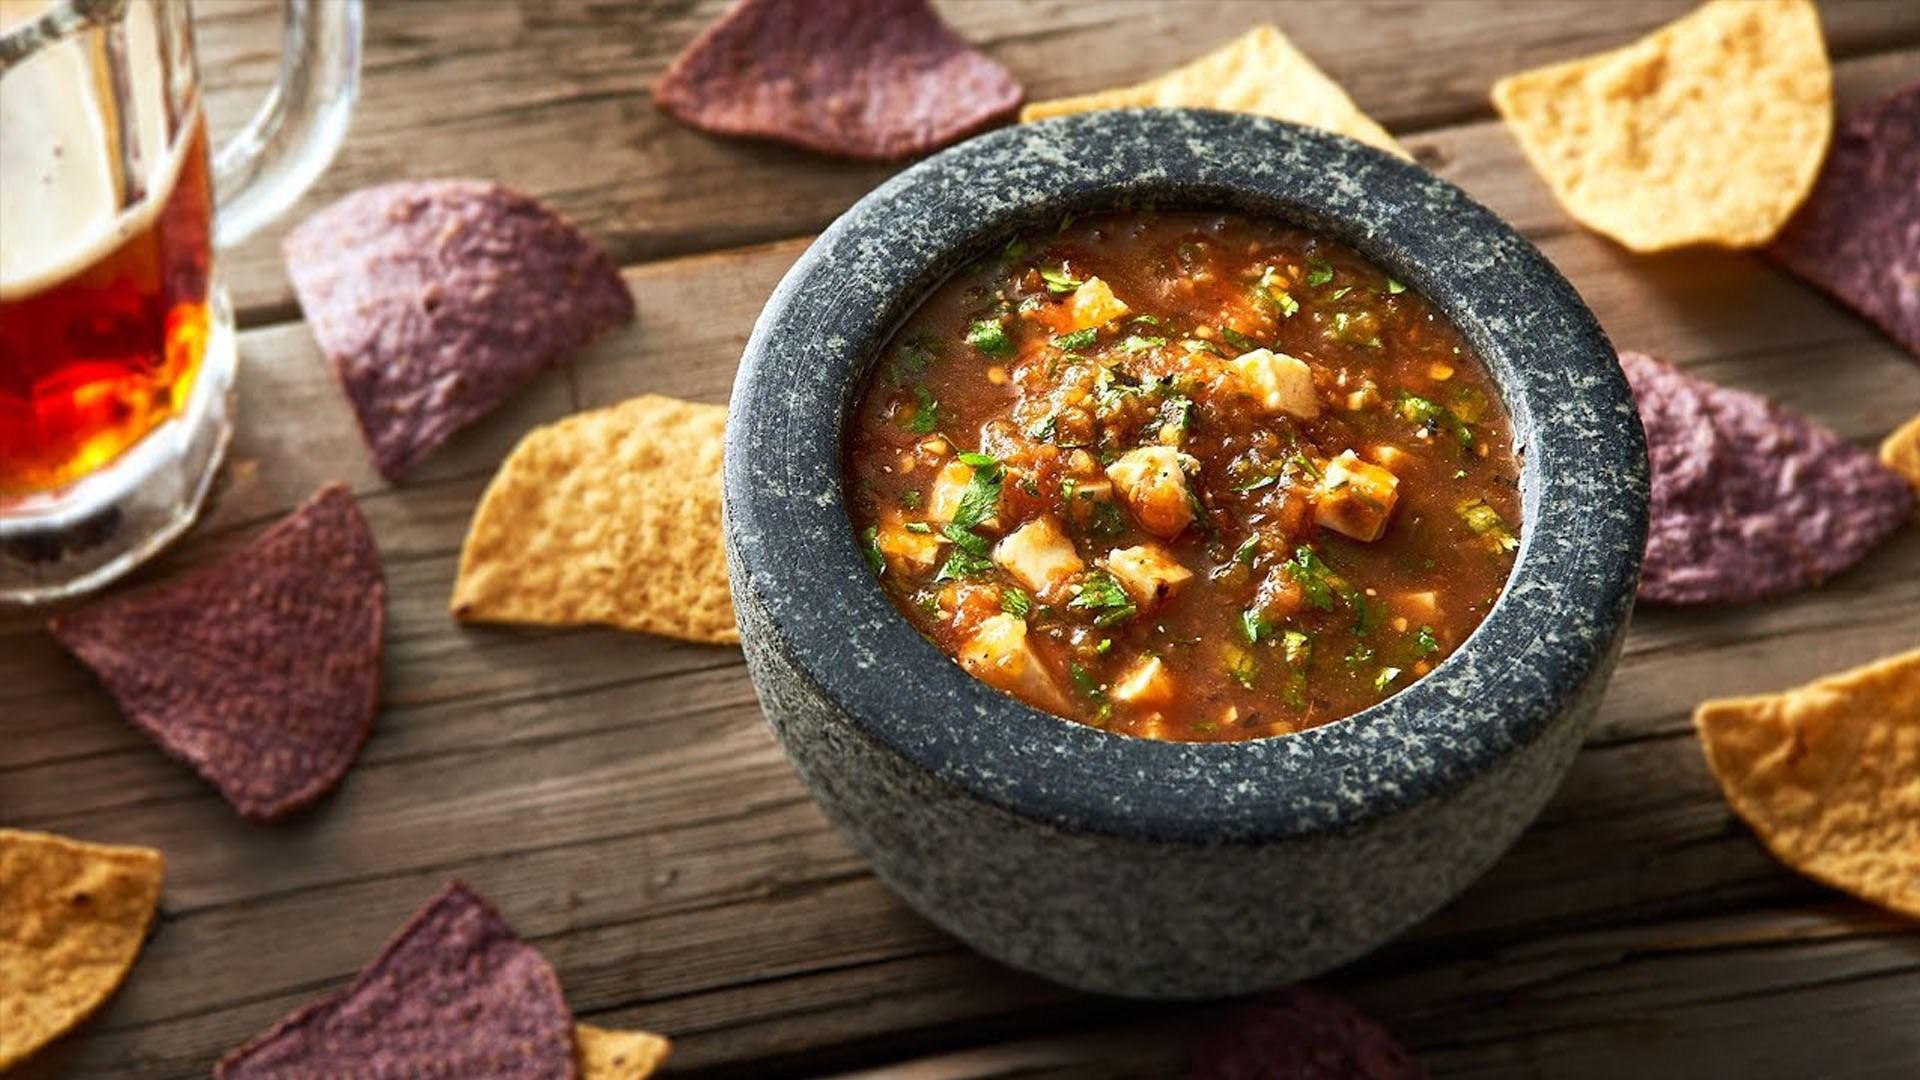 Autentica salsa Borracha 2